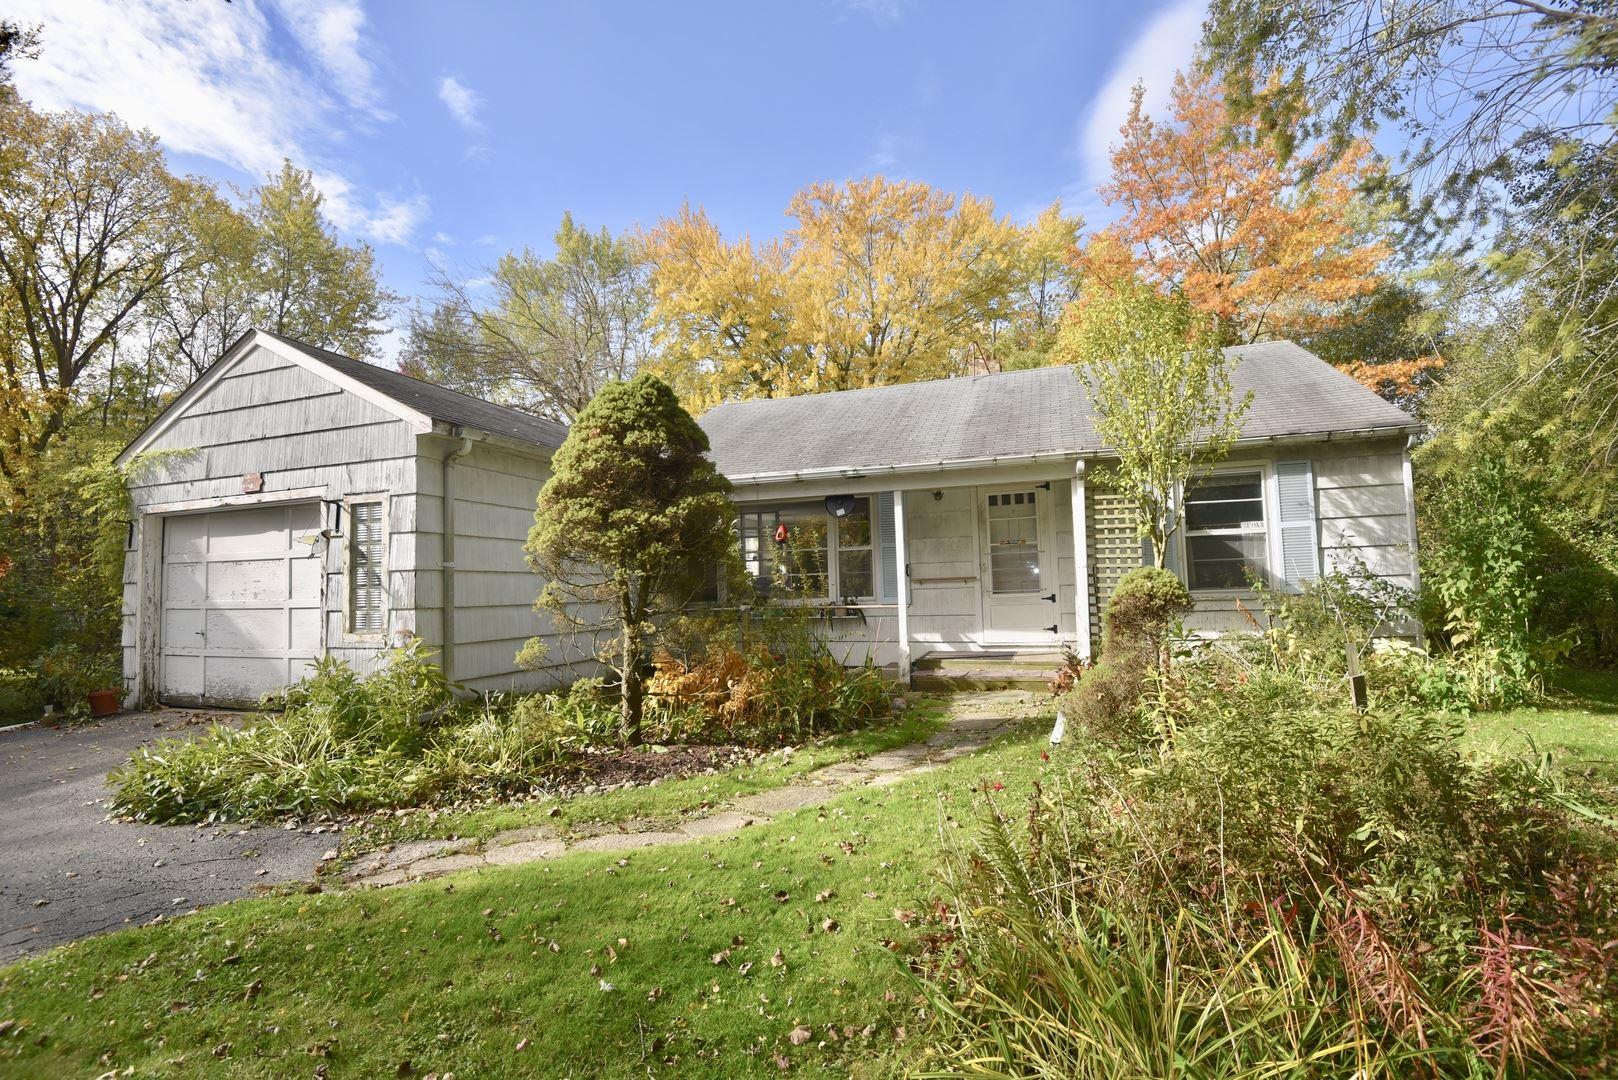 1890 Spruce Street, Highland Park, IL 60035 - #: 10768964